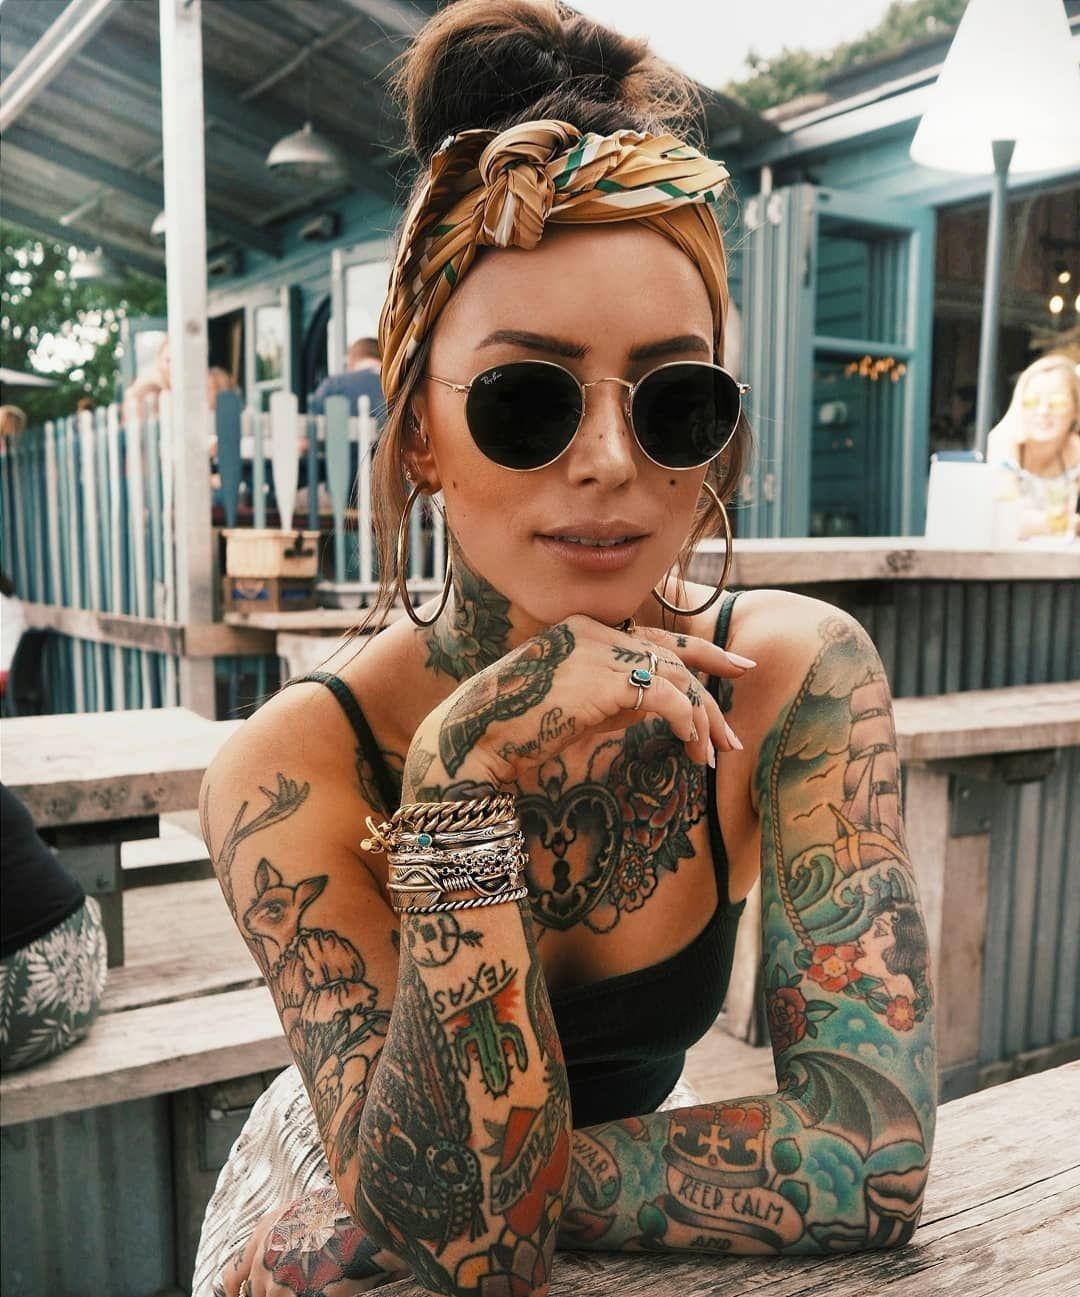 75 More Small Tattoo Ideas From Playground Tattoo Tattoos